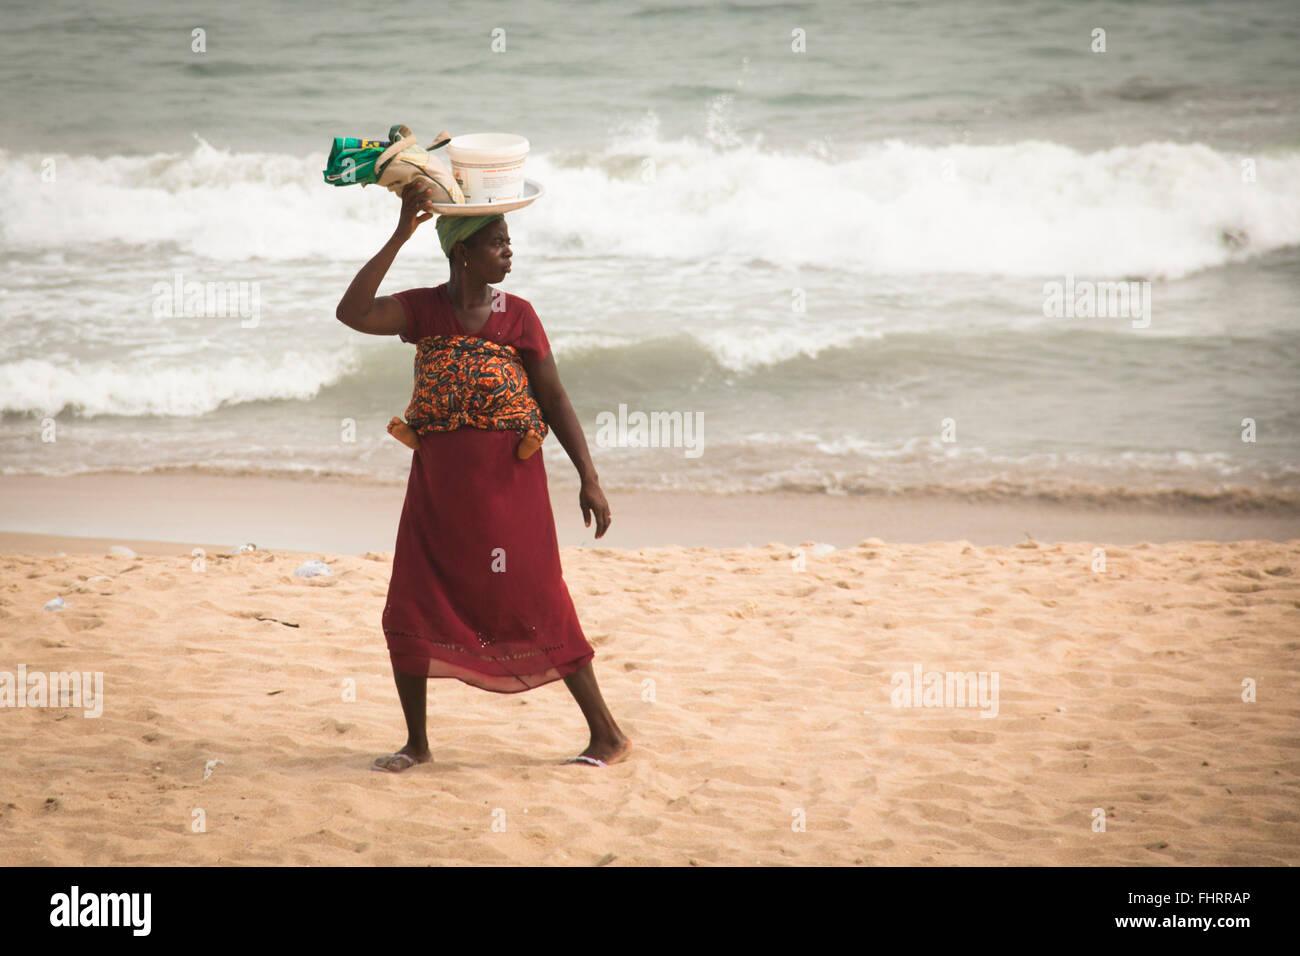 CAPE COAST, GHANA - JANUARY 2016: Woman with a baby on the beach in Cape Coast, Ghana at the Gulf of Guinea - Stock Image